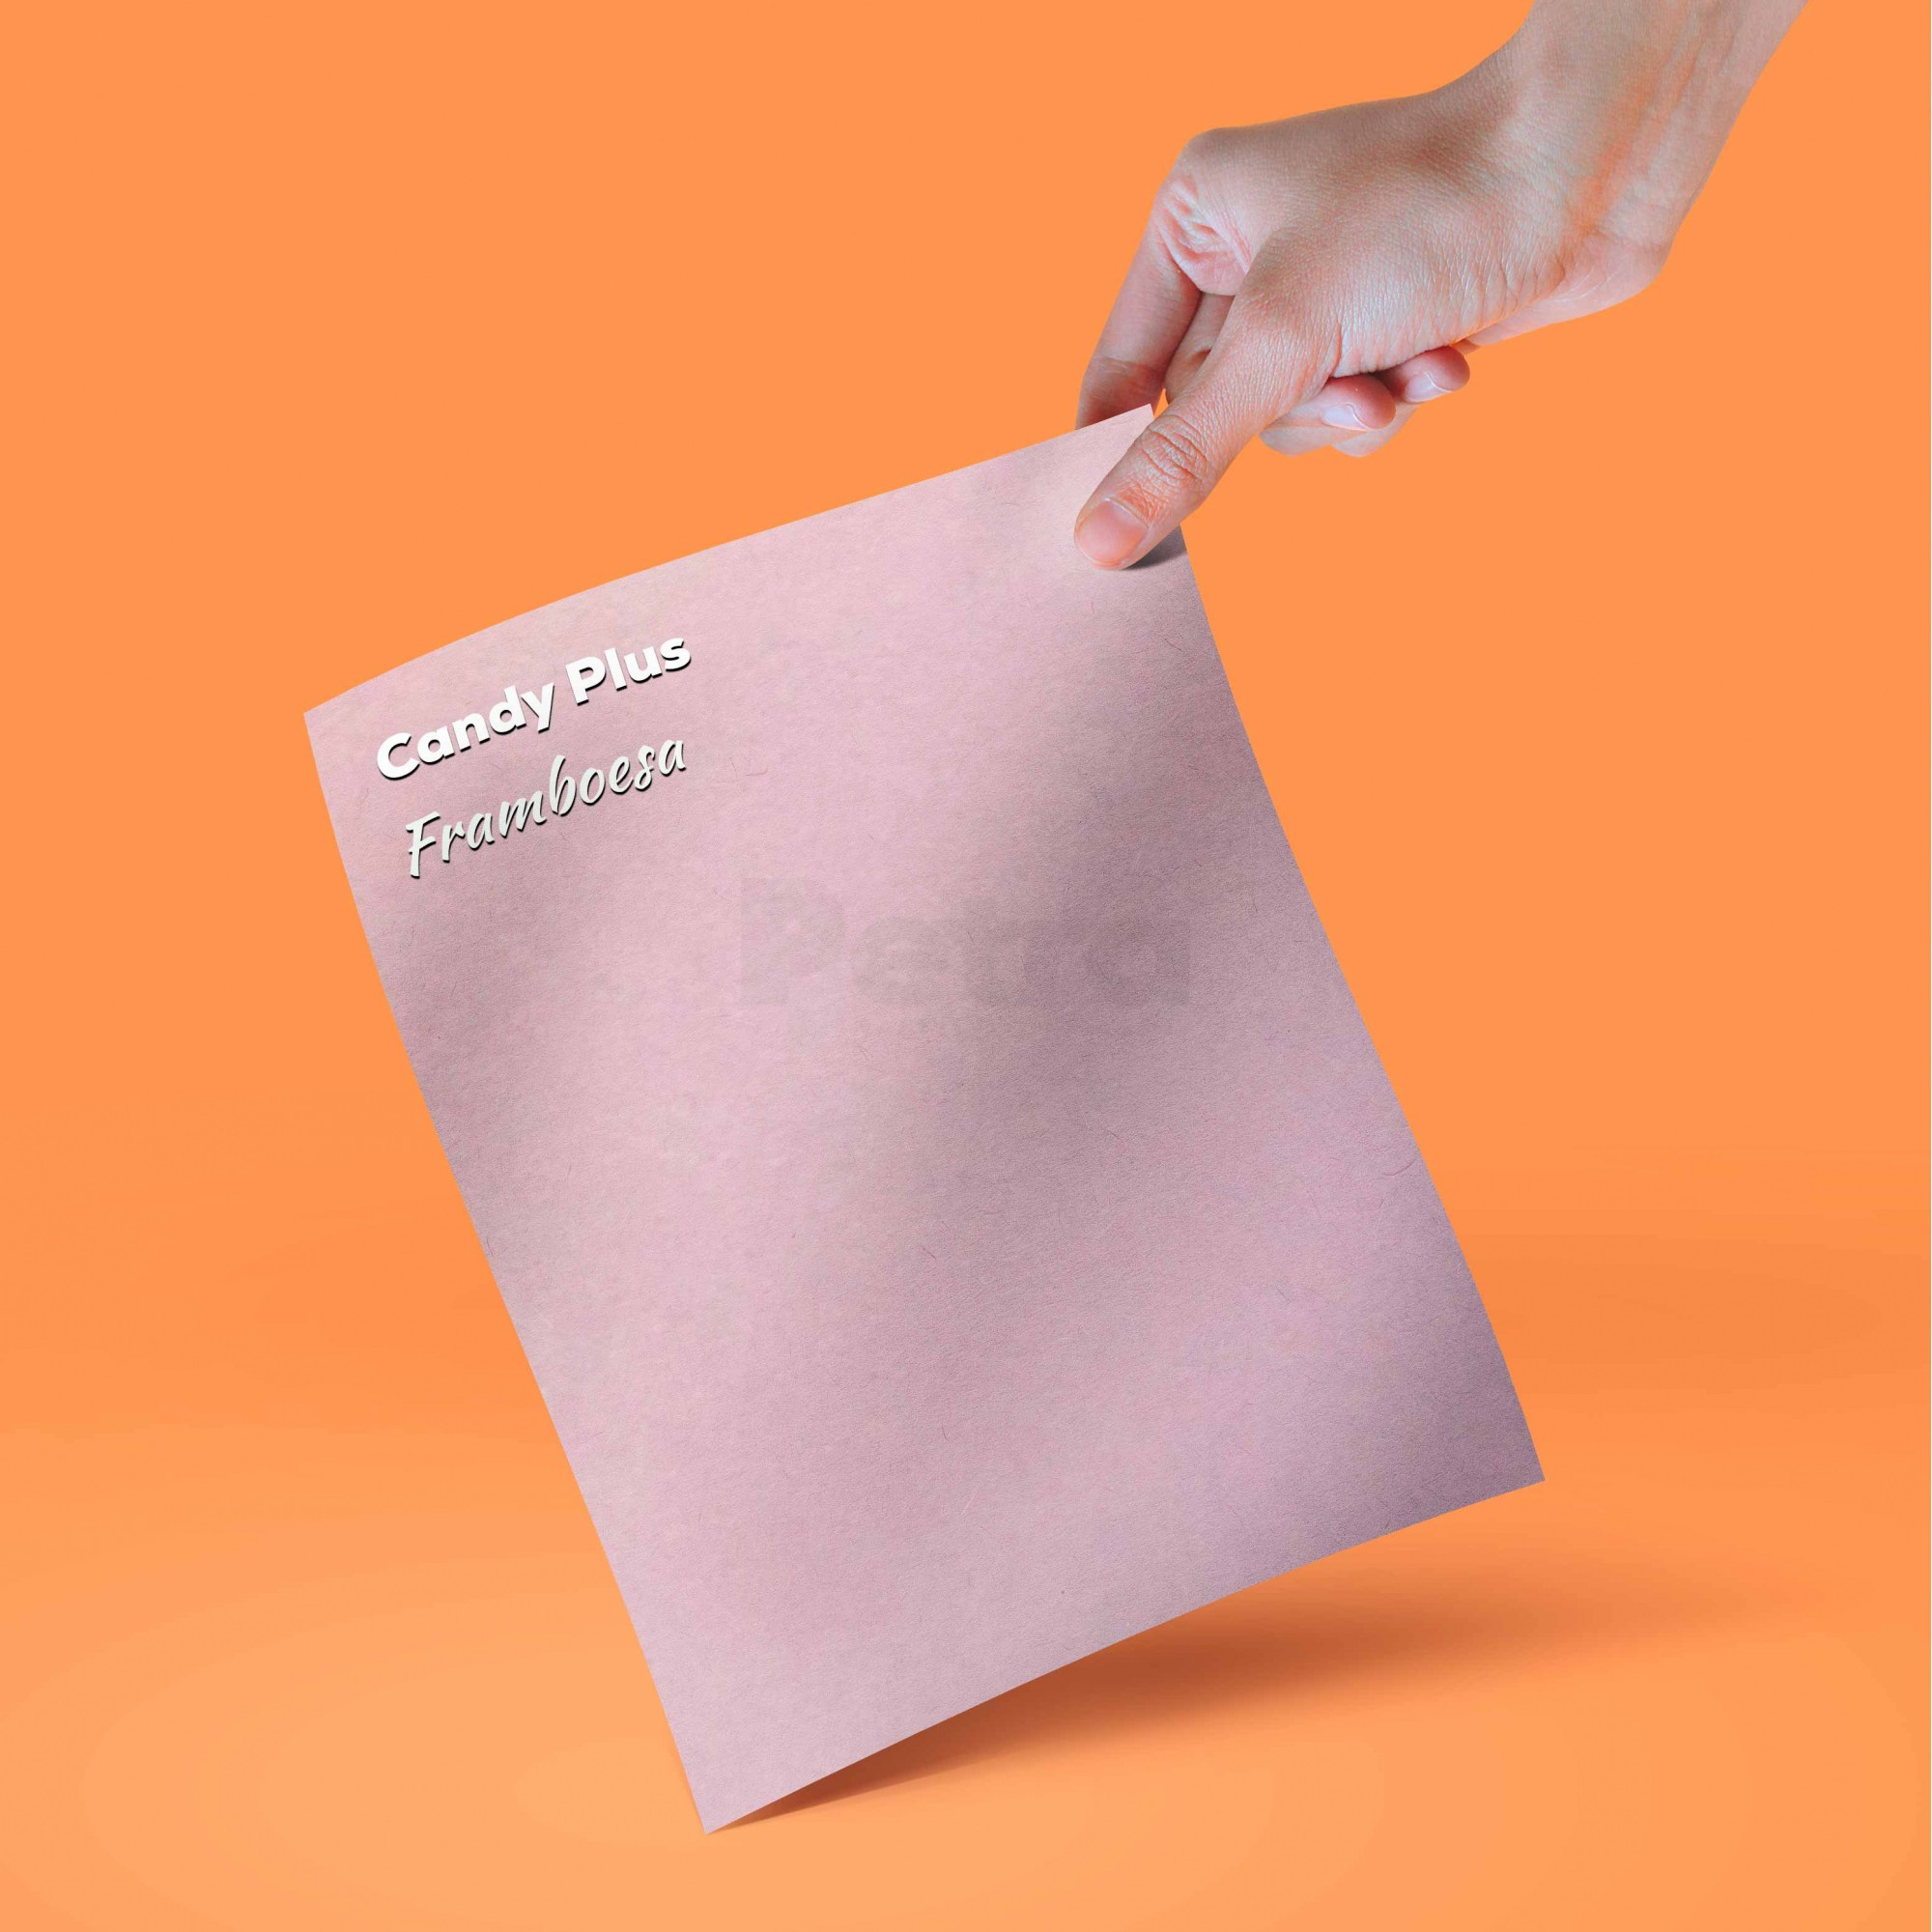 Candy Plus - Framboesa - Lilas - Tam. A4 - 240g/m² - 20 folhas